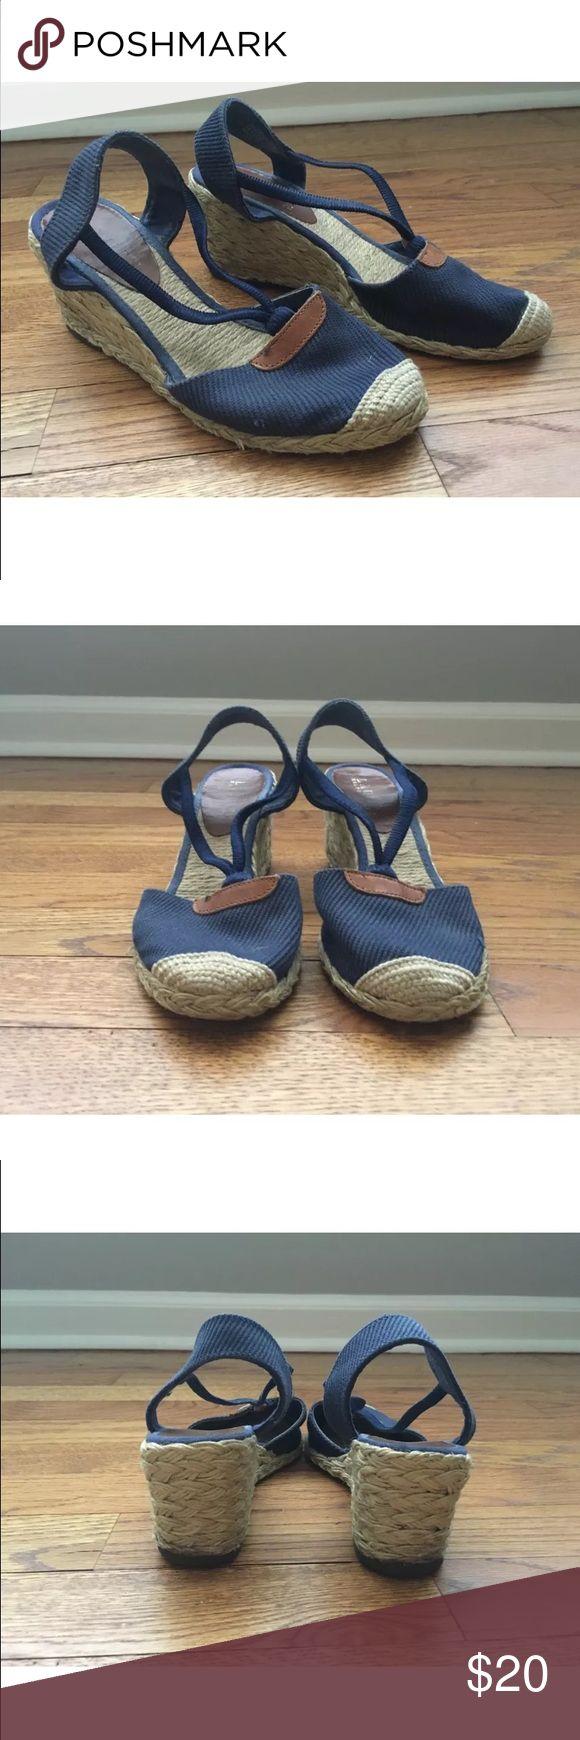 Ralph Lauren Cala Navy Espadrilles Sz 5.5 Beyond adorable Ralph Lauren Espadrilles perfect for your upcoming Holiday! Ralph Lauren Shoes Espadrilles